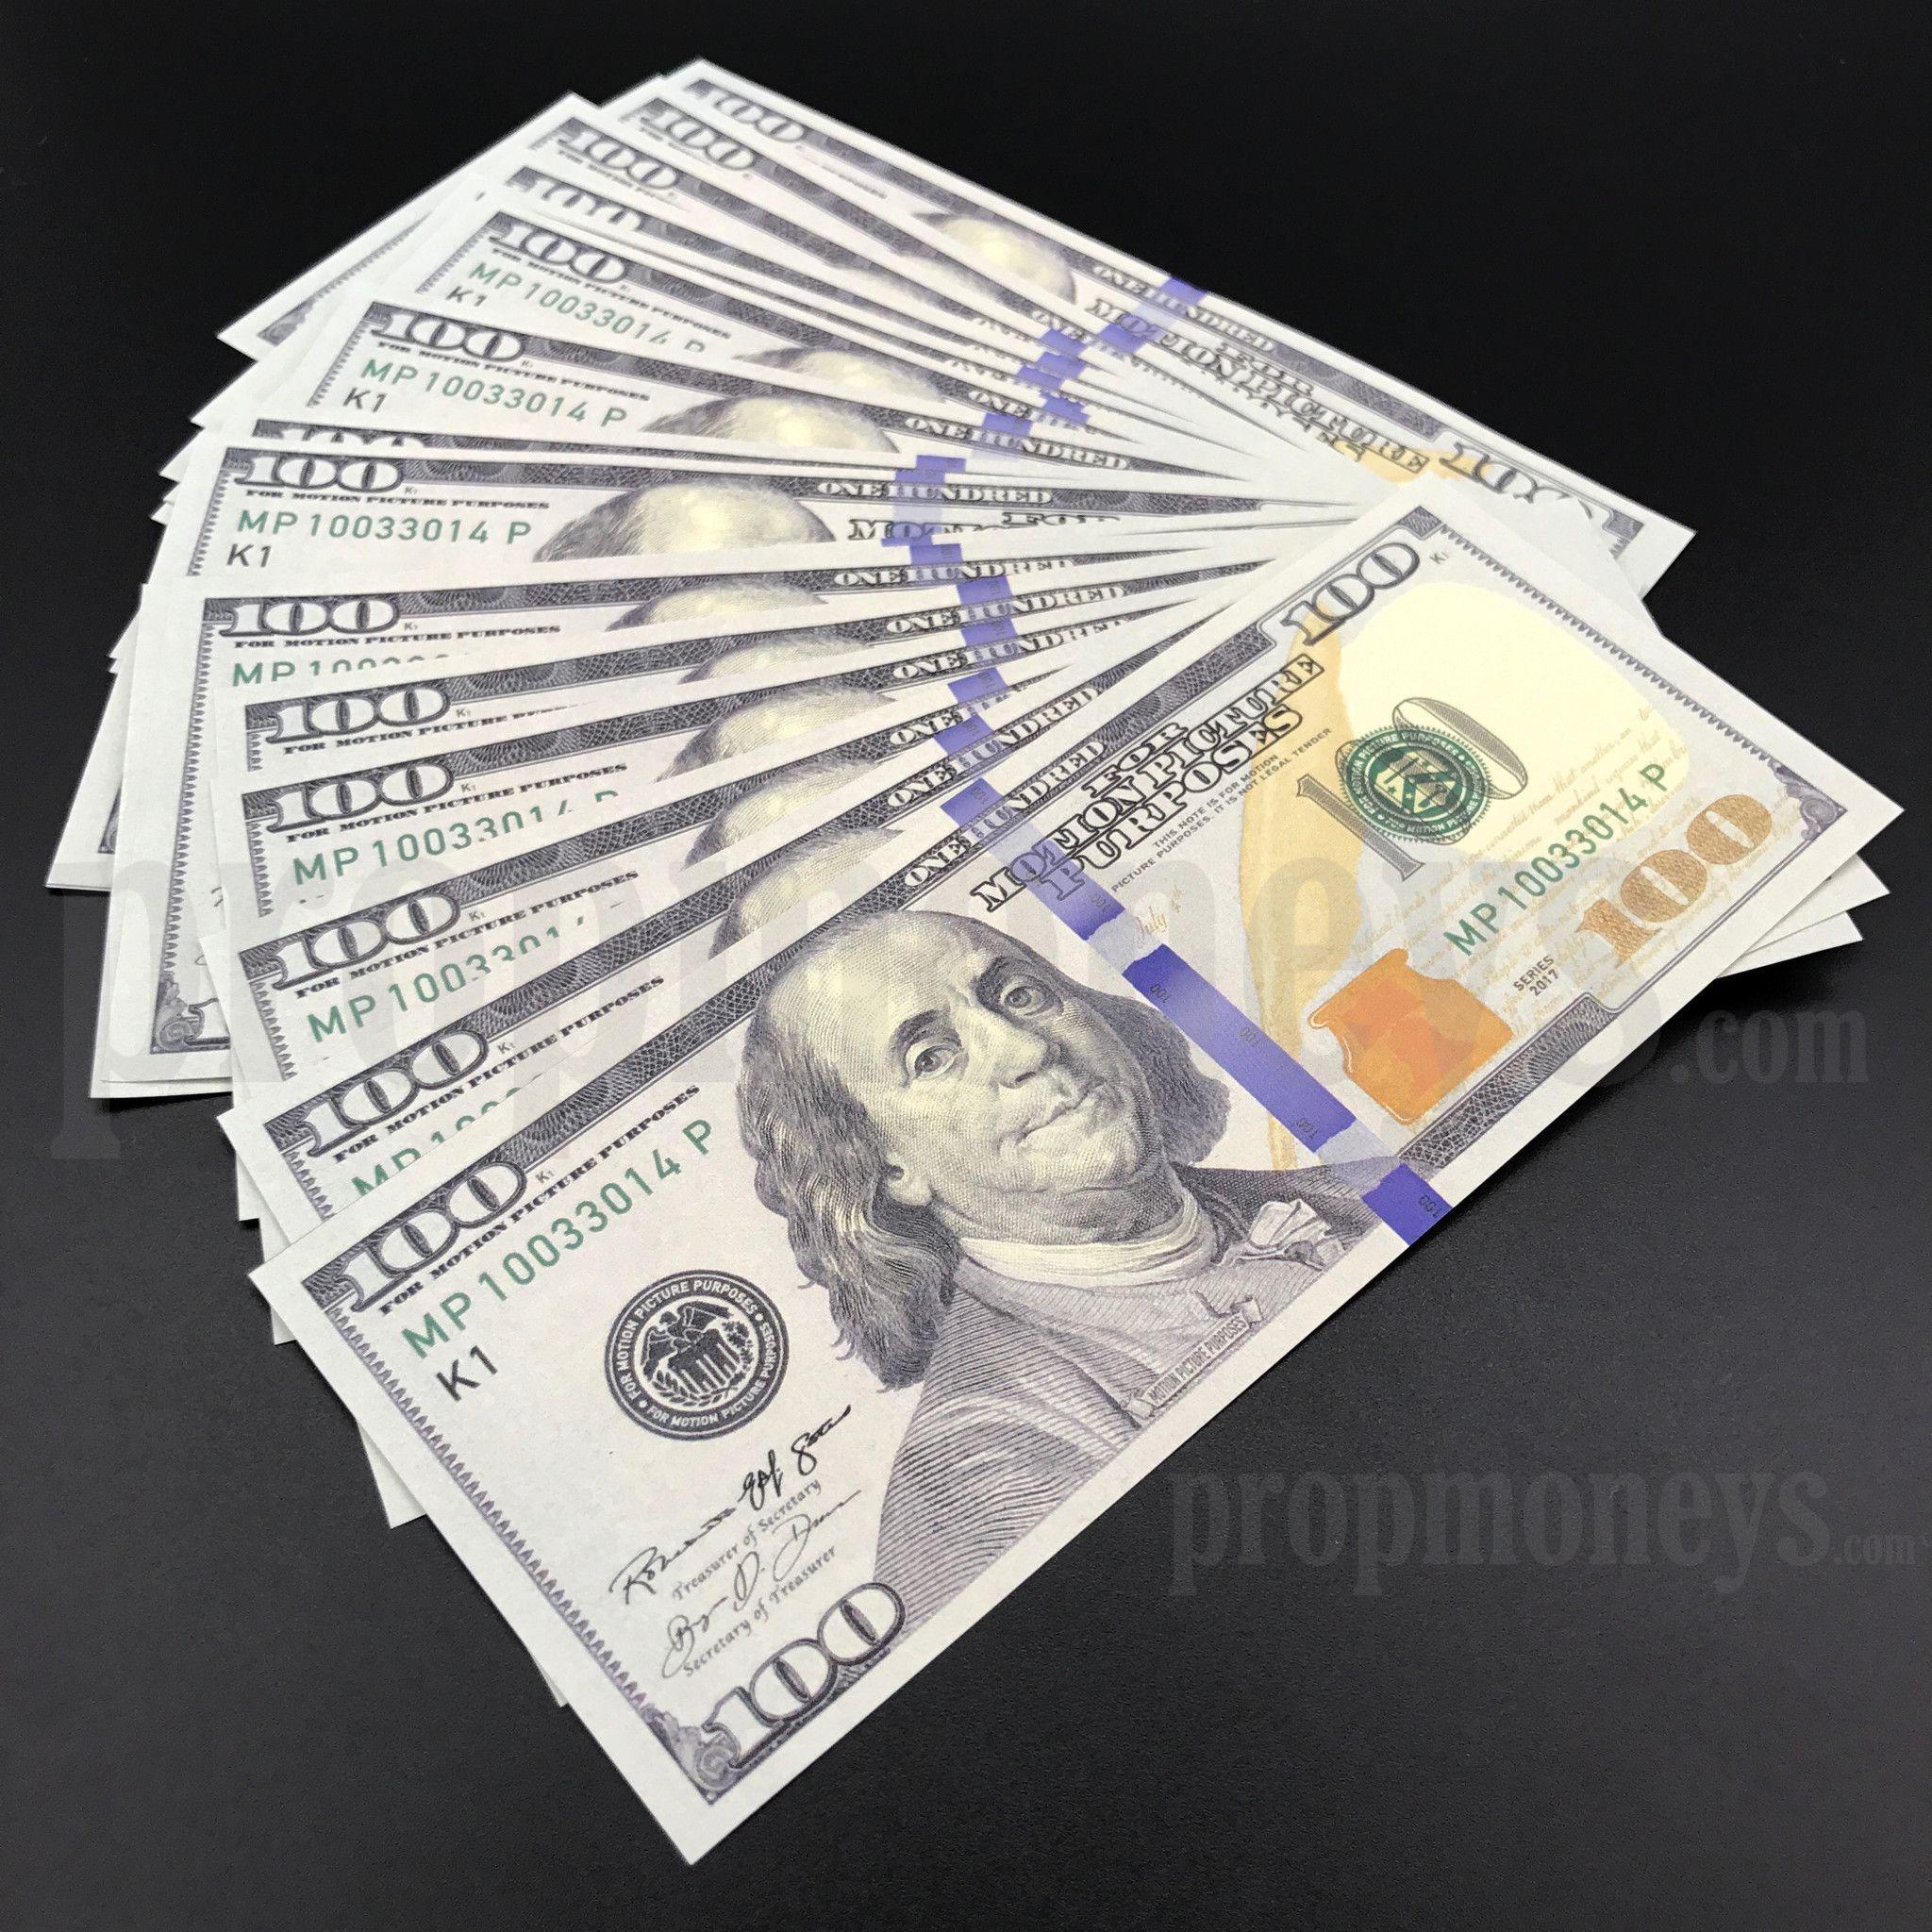 25x 100 Dollar Bills 2 500 Dollars New Style Prop Money Dollar Money Money Bill 100 Dollar Bill